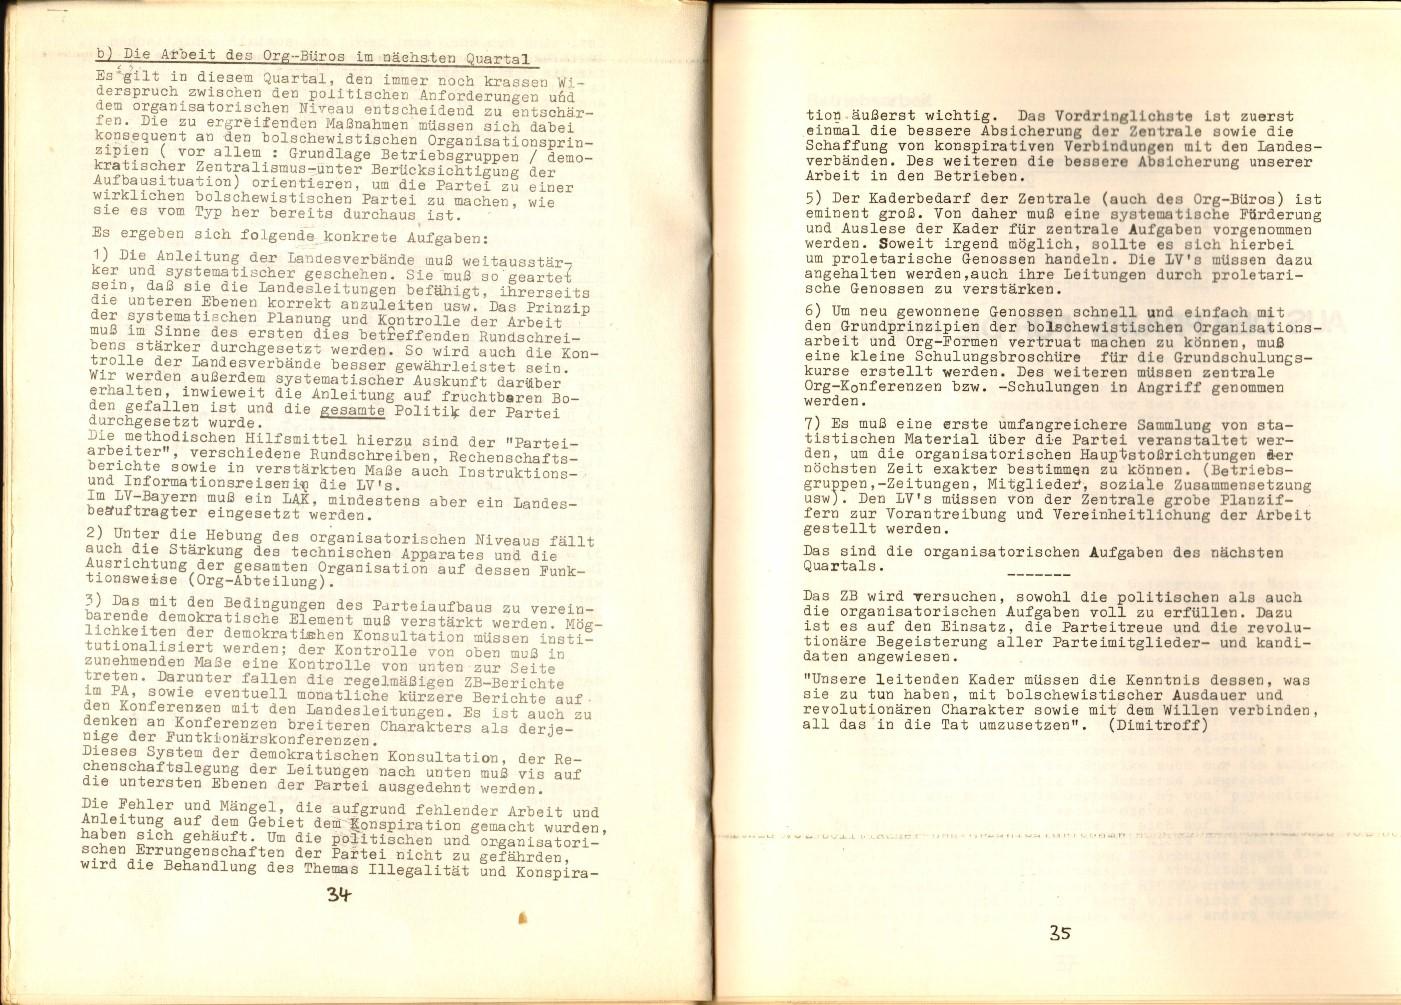 ZB_Parteiarbeiter_1970_03_22